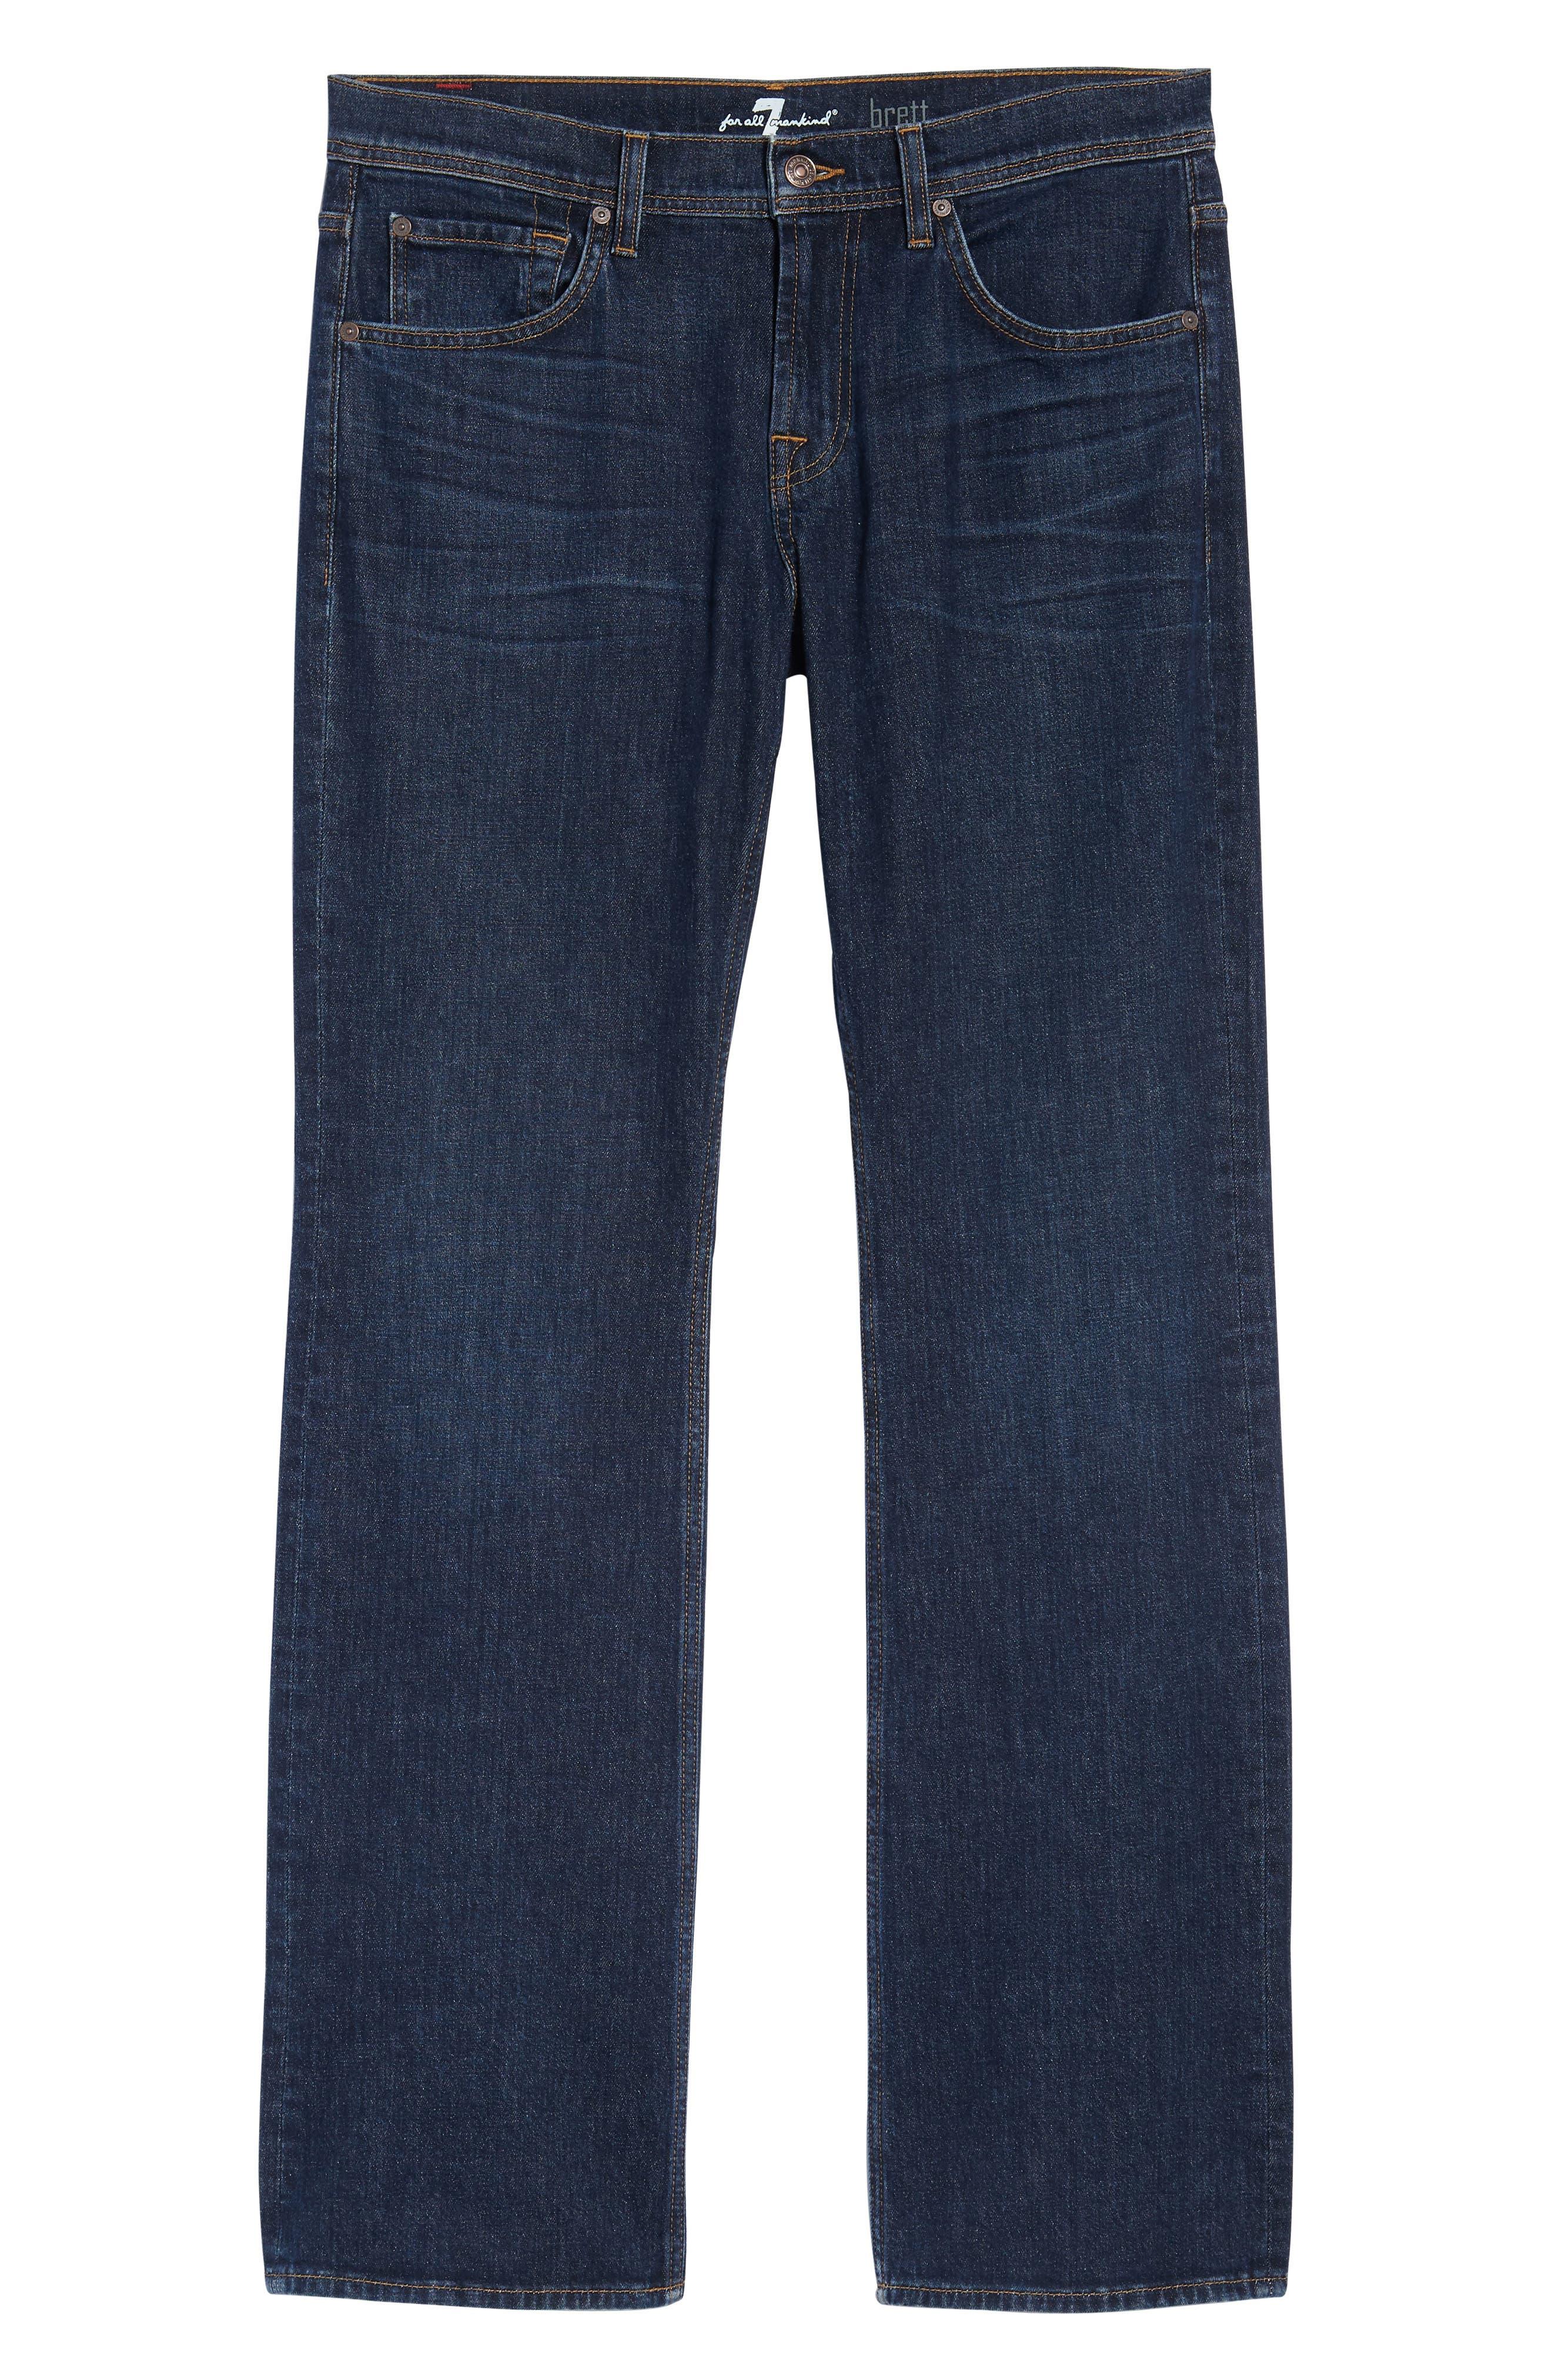 Brett Bootcut Jeans,                             Alternate thumbnail 6, color,